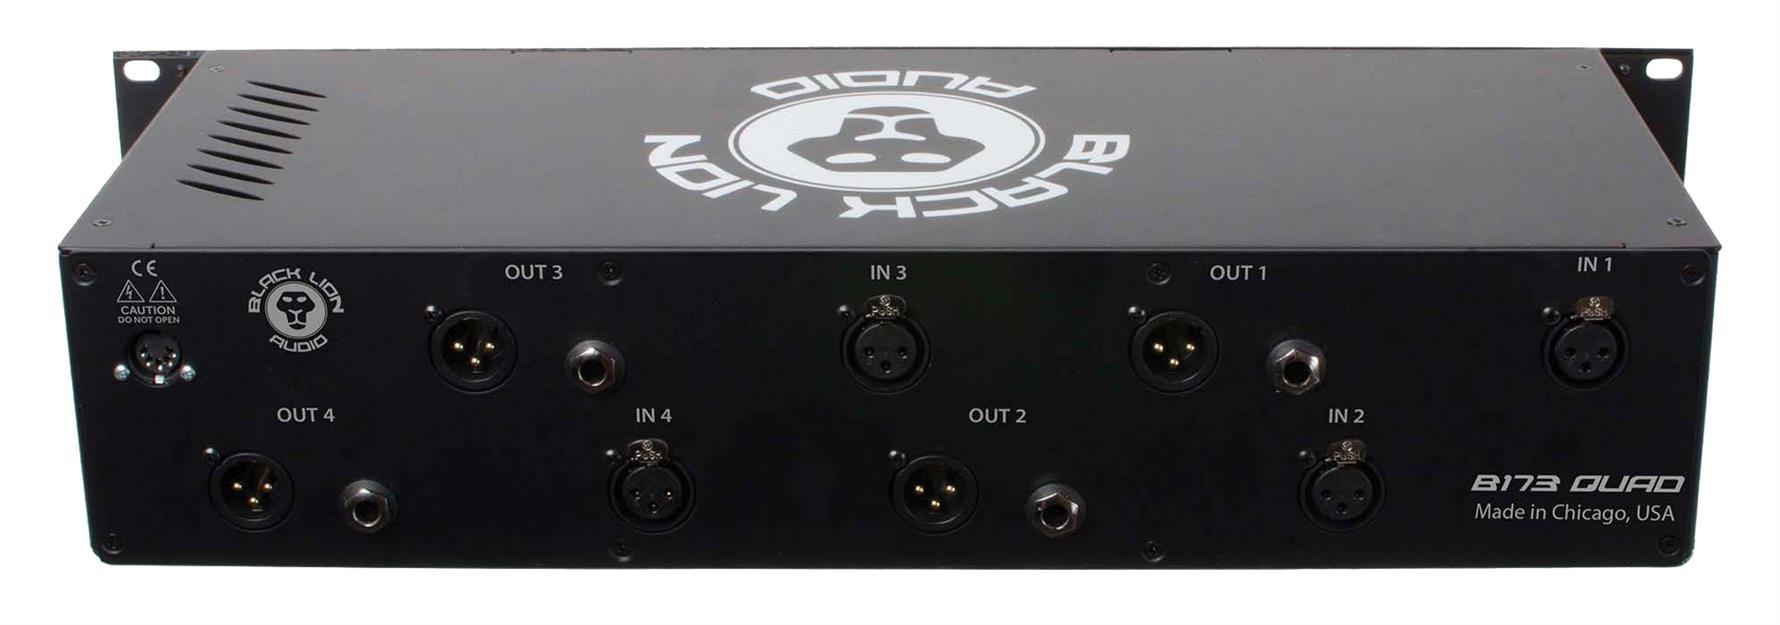 Black_Lion_Audio_B173 Quad_怡同科技